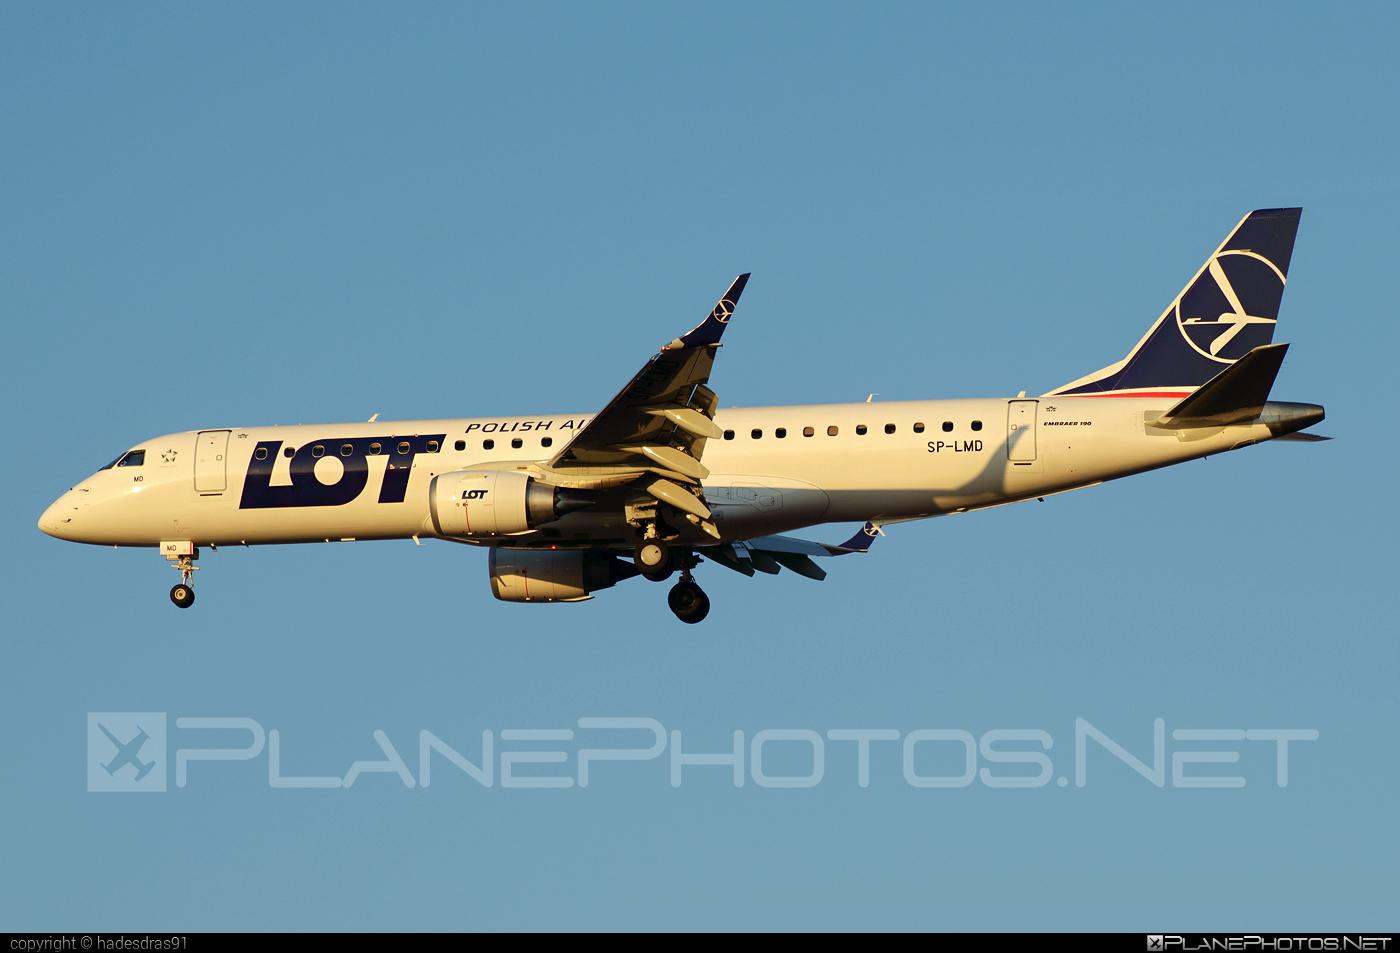 Embraer E190STD (ERJ-190-100STD) - SP-LMD operated by LOT Polish Airlines #e190 #e190100 #e190100std #e190std #embraer #embraer190 #embraer190100std #embraer190std #lot #lotpolishairlines